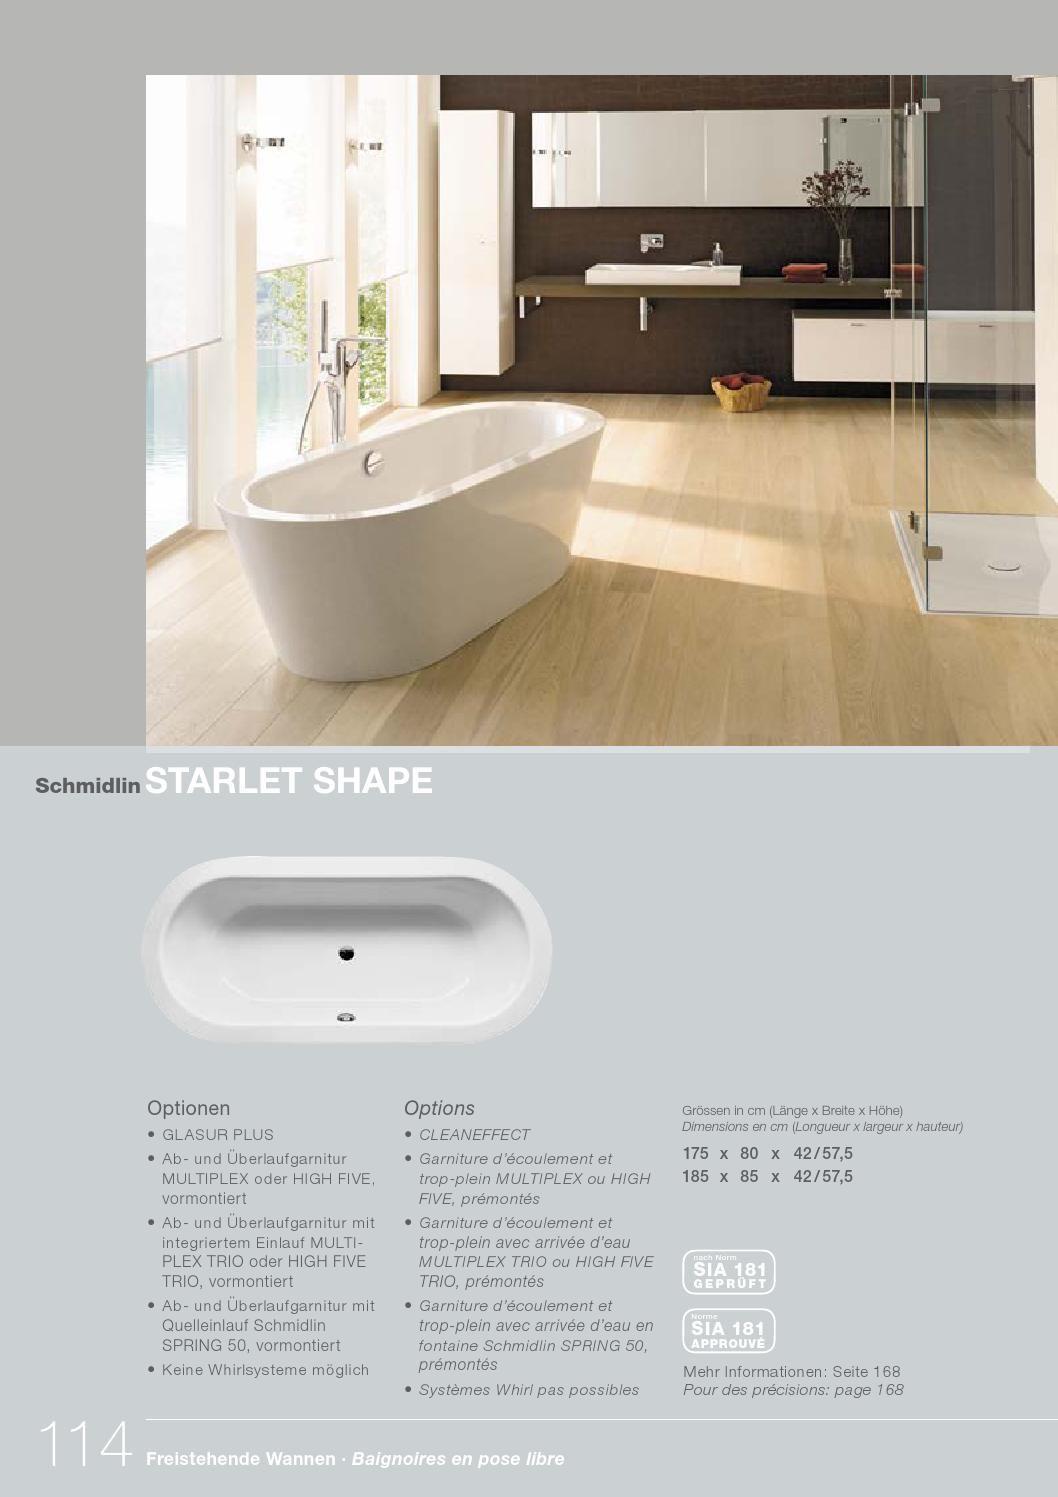 Schmidlin stahlbadewannen katalog 2016 d f baden duschen for Badezimmer katalog